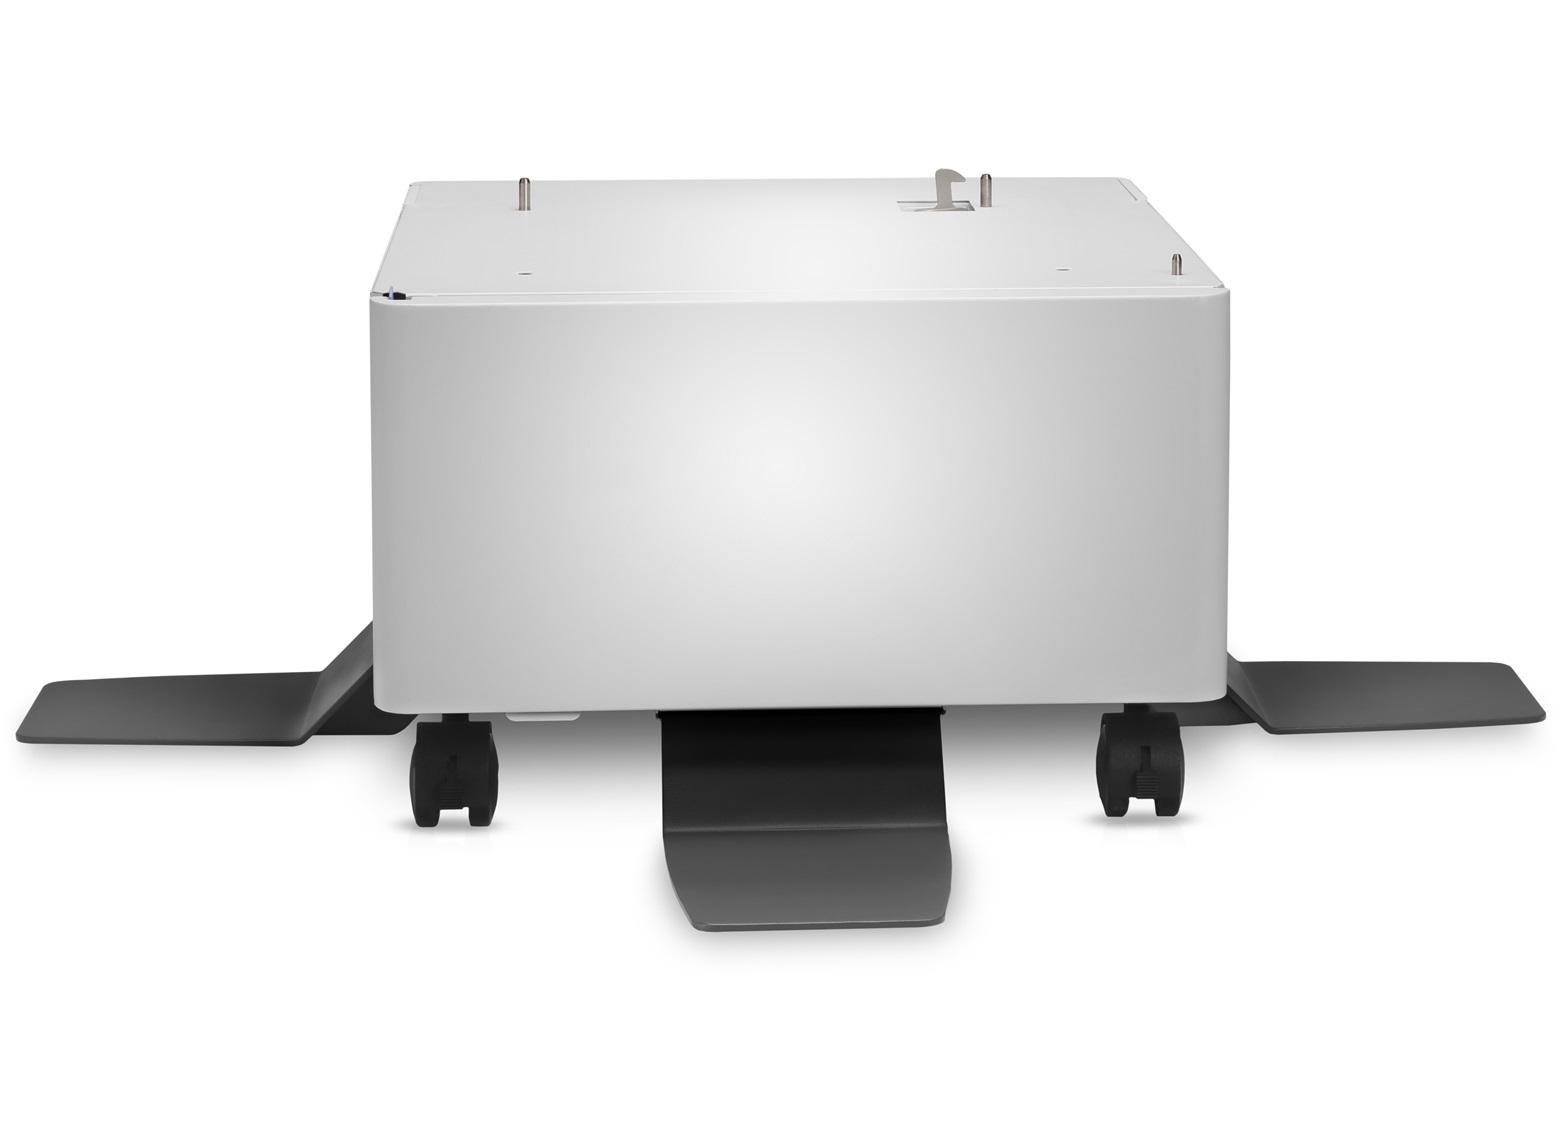 HP Drucker-Schrank B5L51A für HP Color LaserJet Enterprise M552/M553